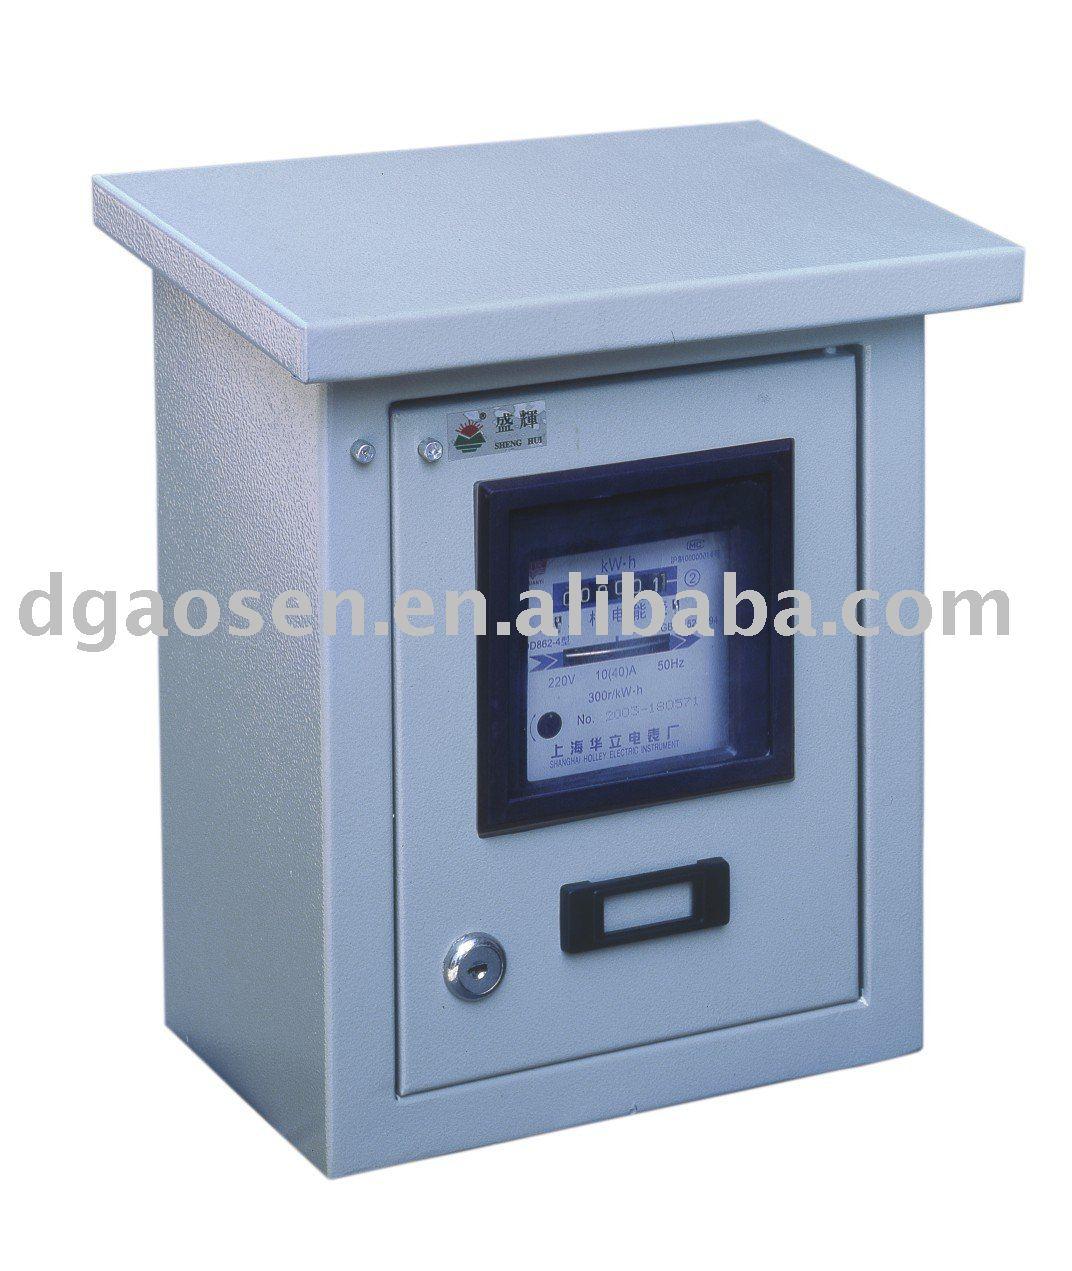 Outdoor Electricity Meter : Outdoor electric meter box view aosheng